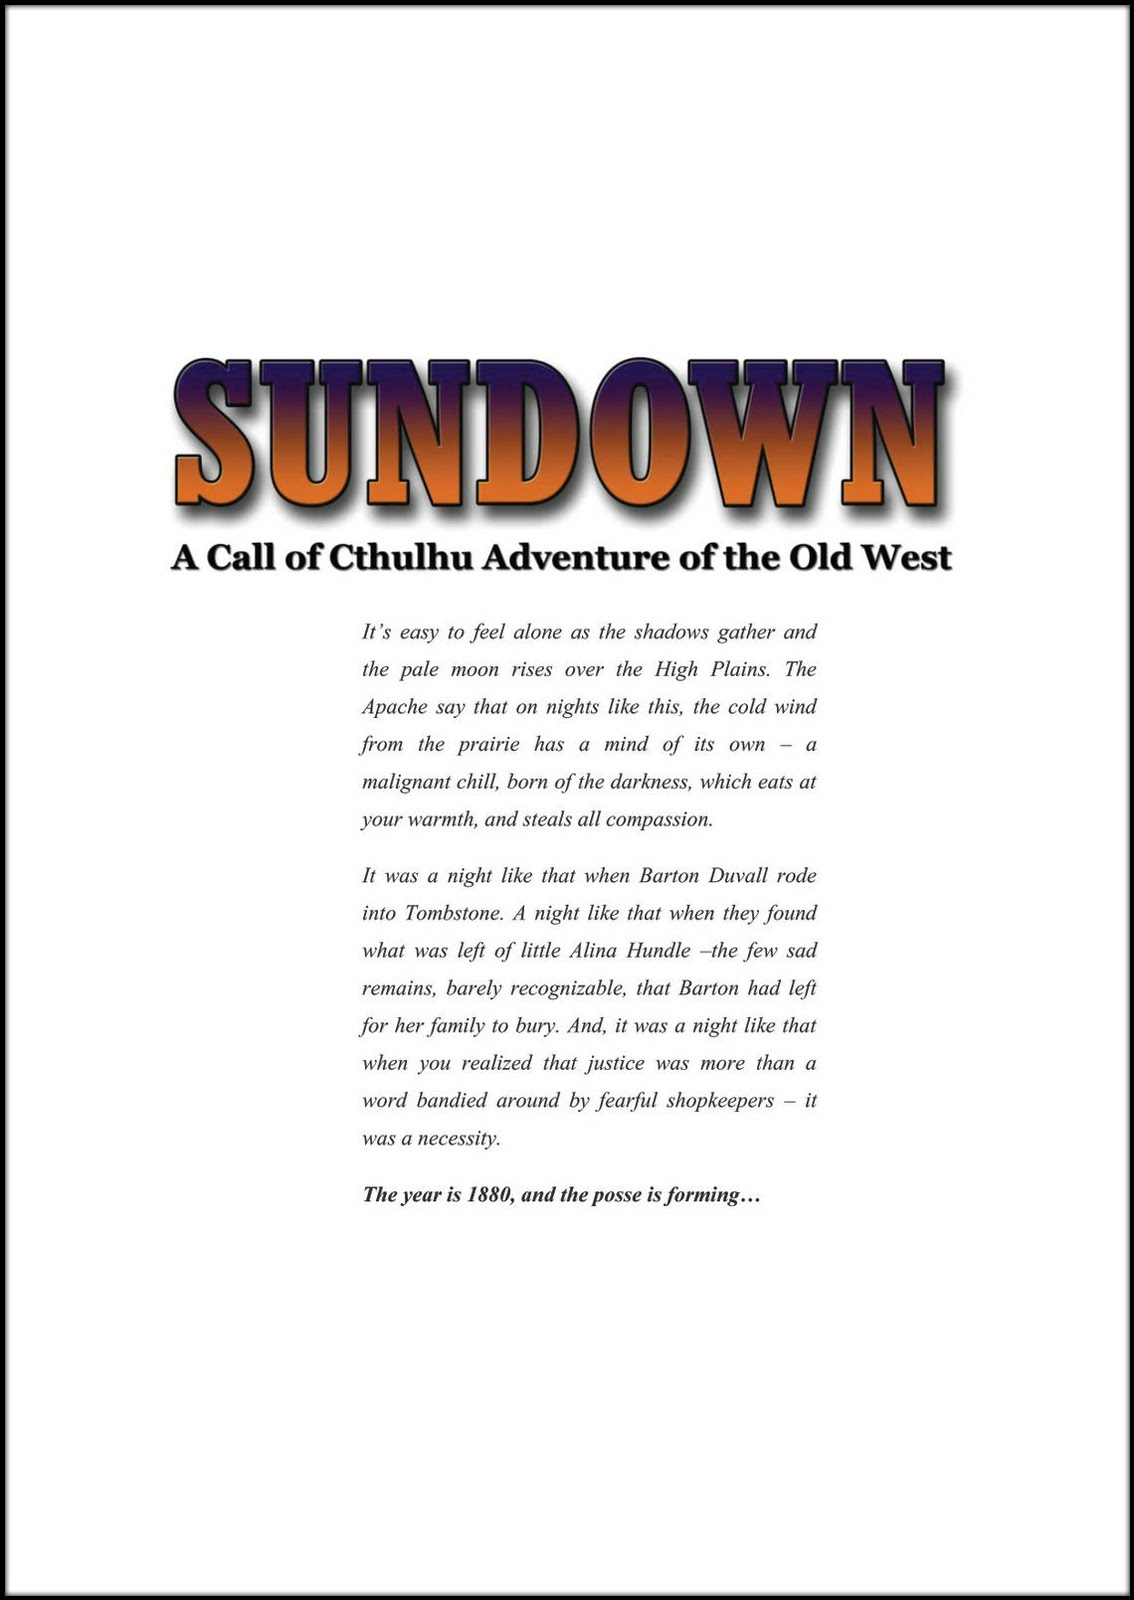 http://i0.wp.com/2.bp.blogspot.com/-xtjsU4wOyJU/Tr8jiUjPqII/AAAAAAAAAxc/AU2wLKHCIJE/s1600/Sundown%2BCover_with_border.jpg?resize=395%2C558